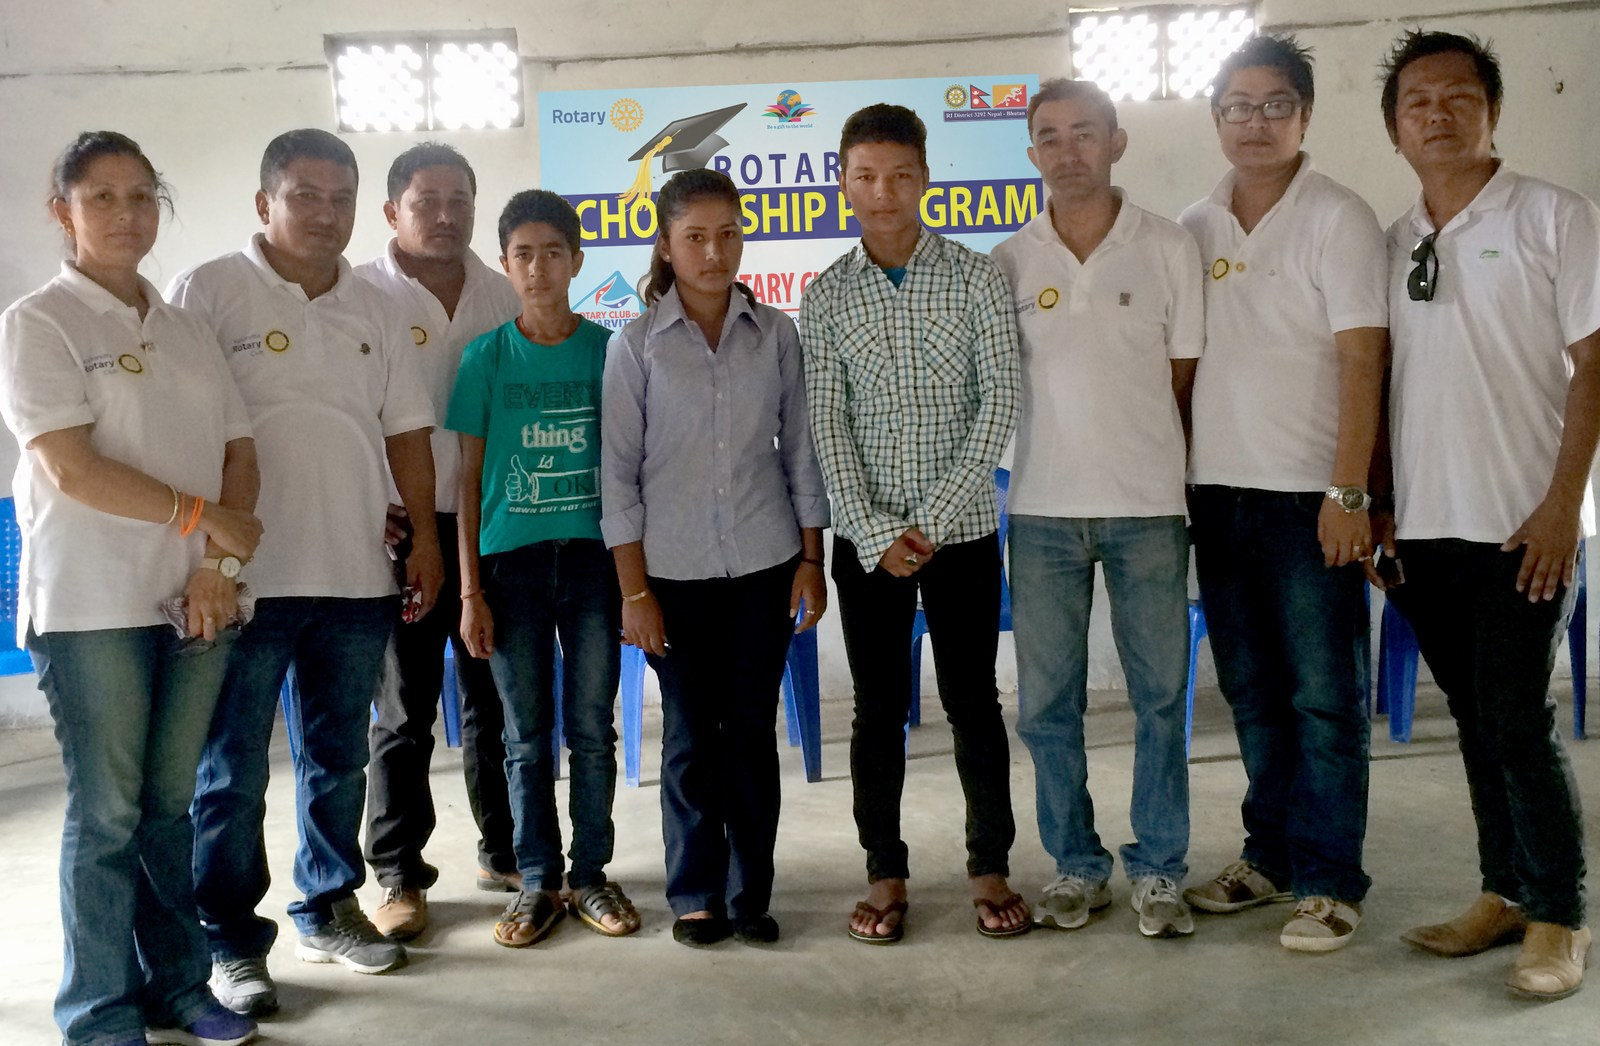 5 Scholarship Distribution Rotary Club Of Kakarvitta 6